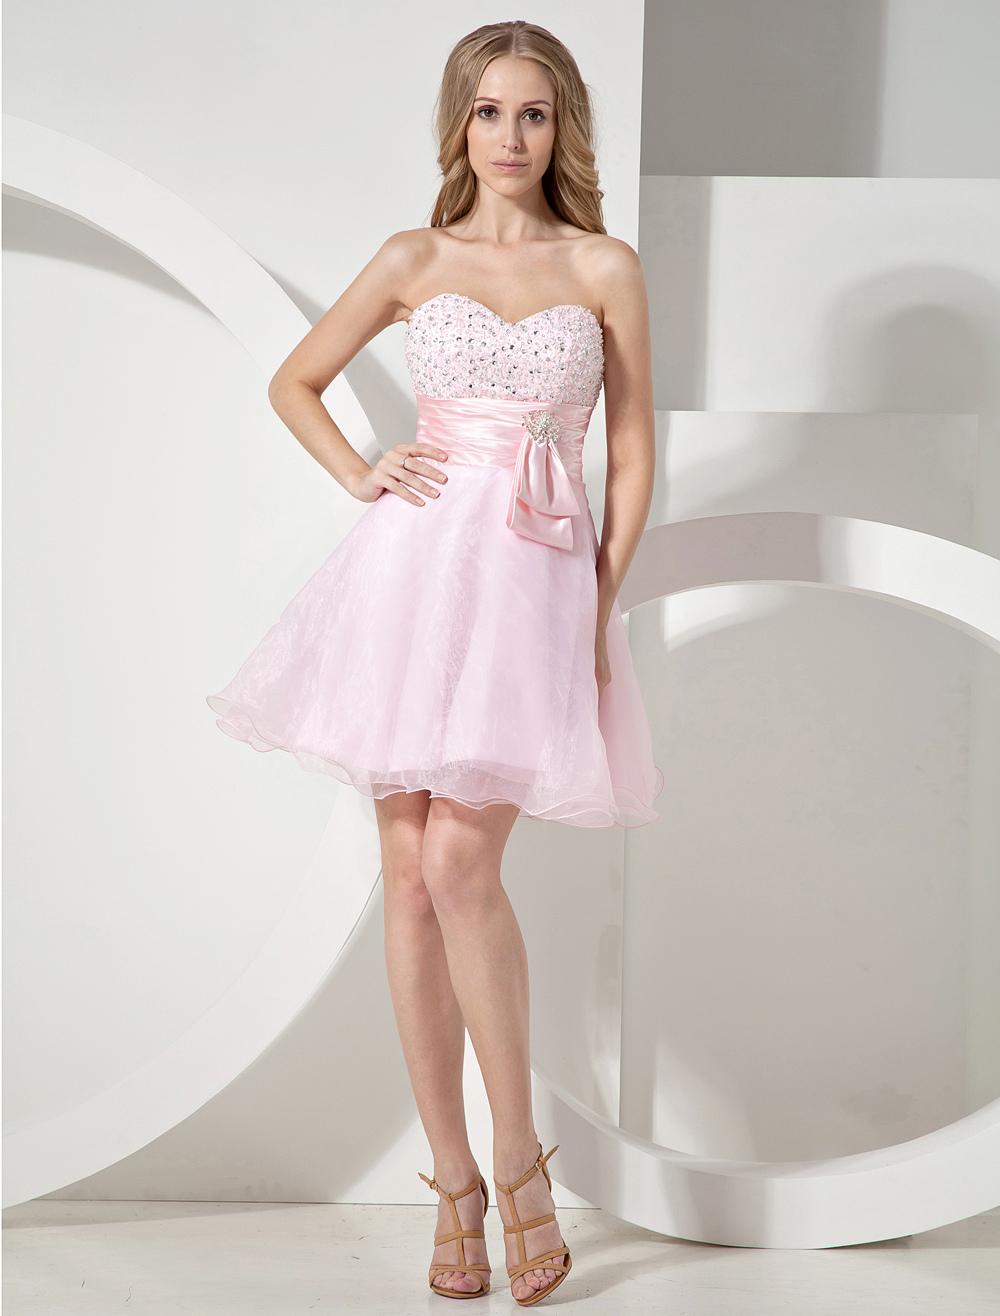 Pink Sweetheart Beading Bow Organza Woman's Prom Dress (Wedding Cheap Party Dress) photo